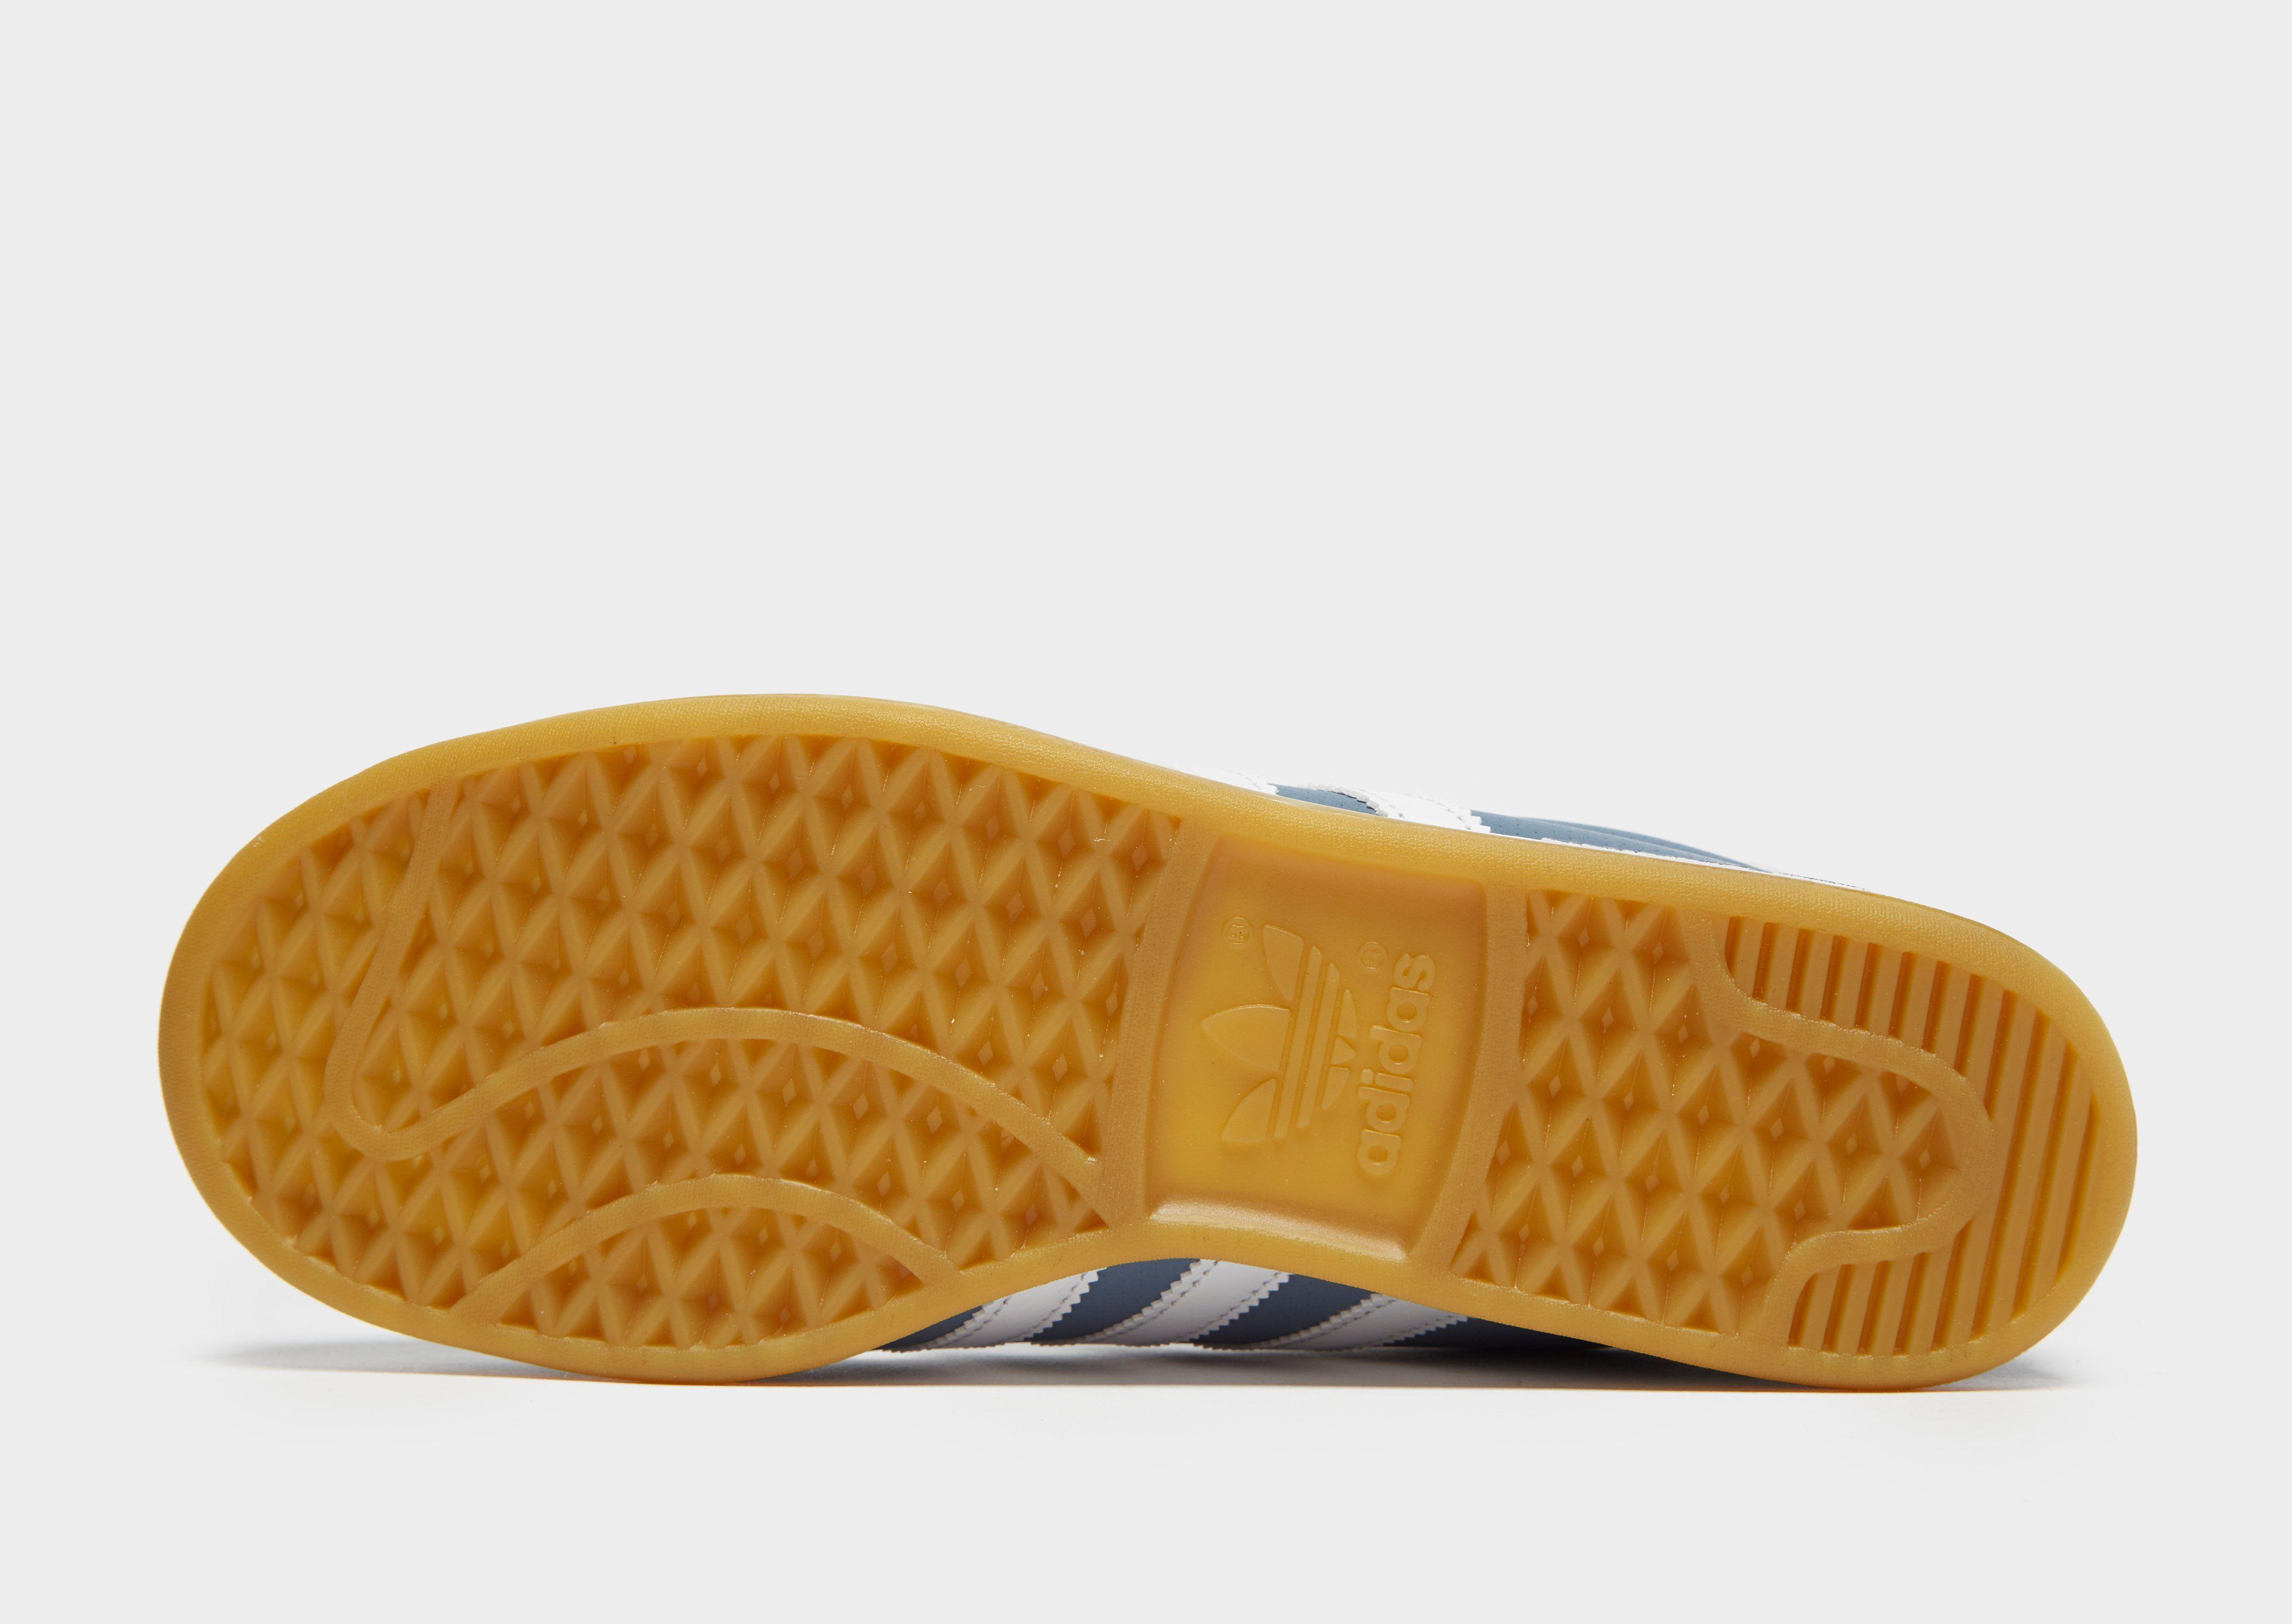 adidas Originals The Sneeker